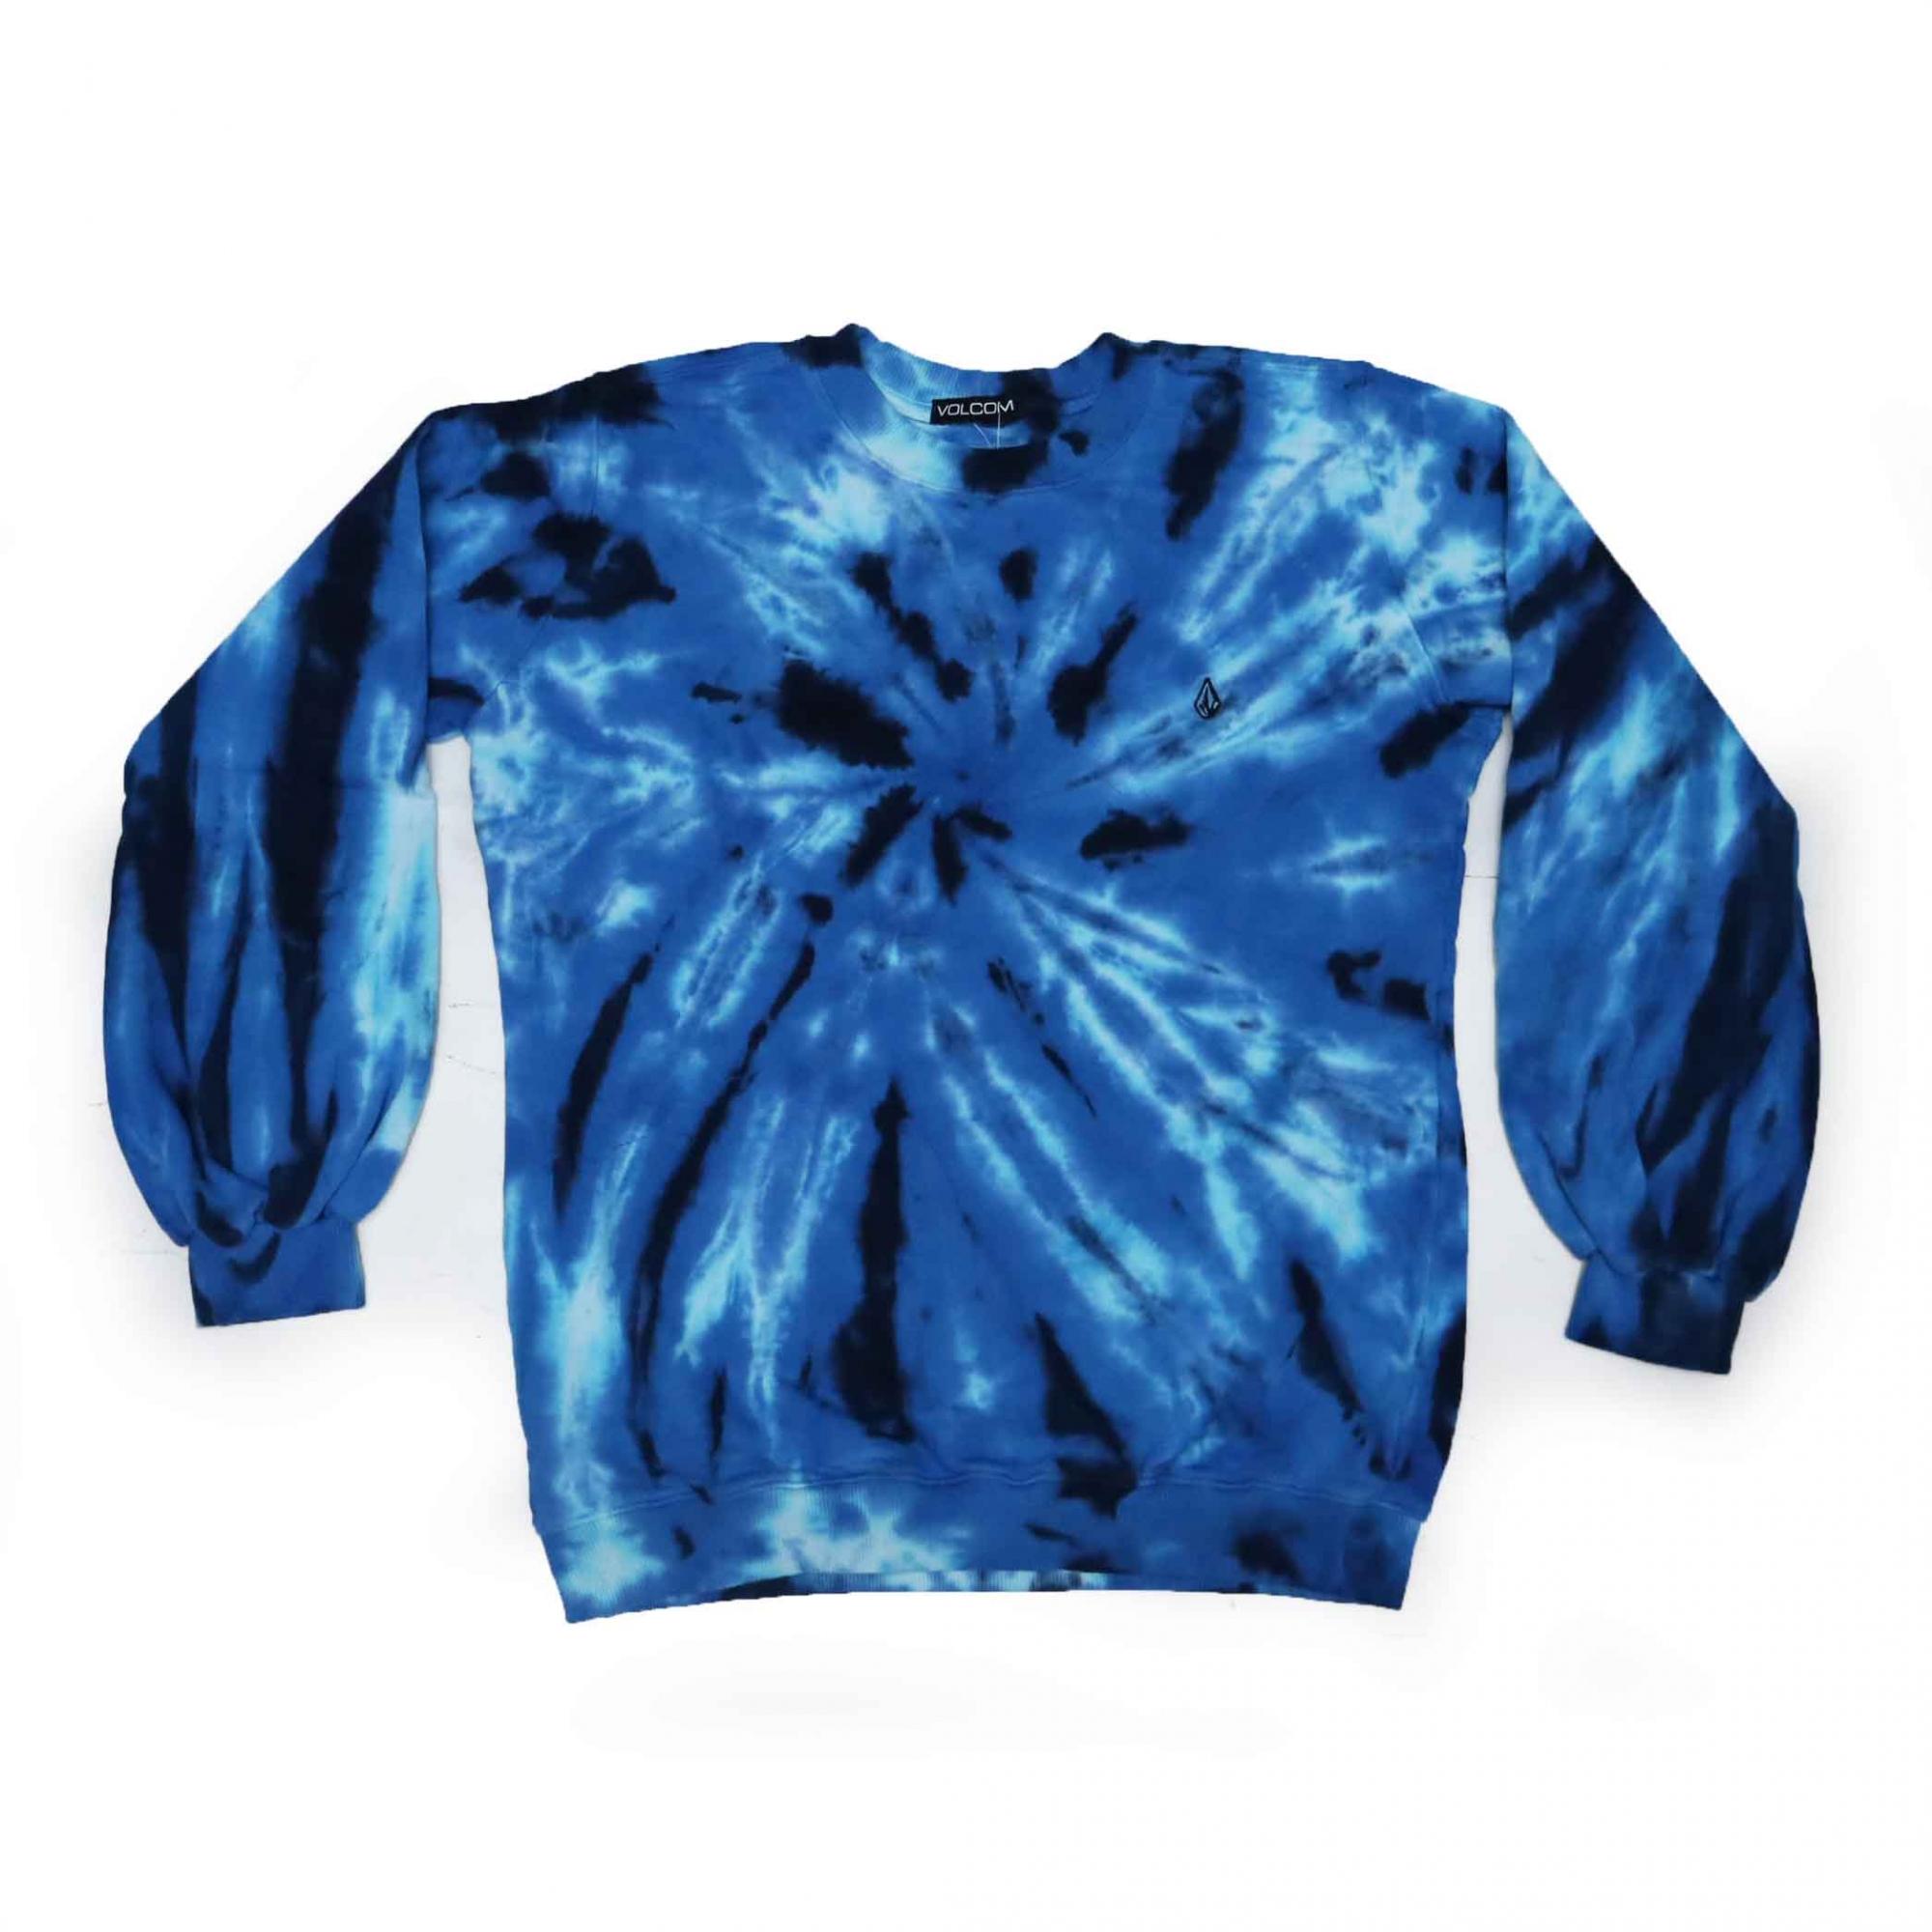 Moletom Volcom Careca Booza - Tie Dye Azul